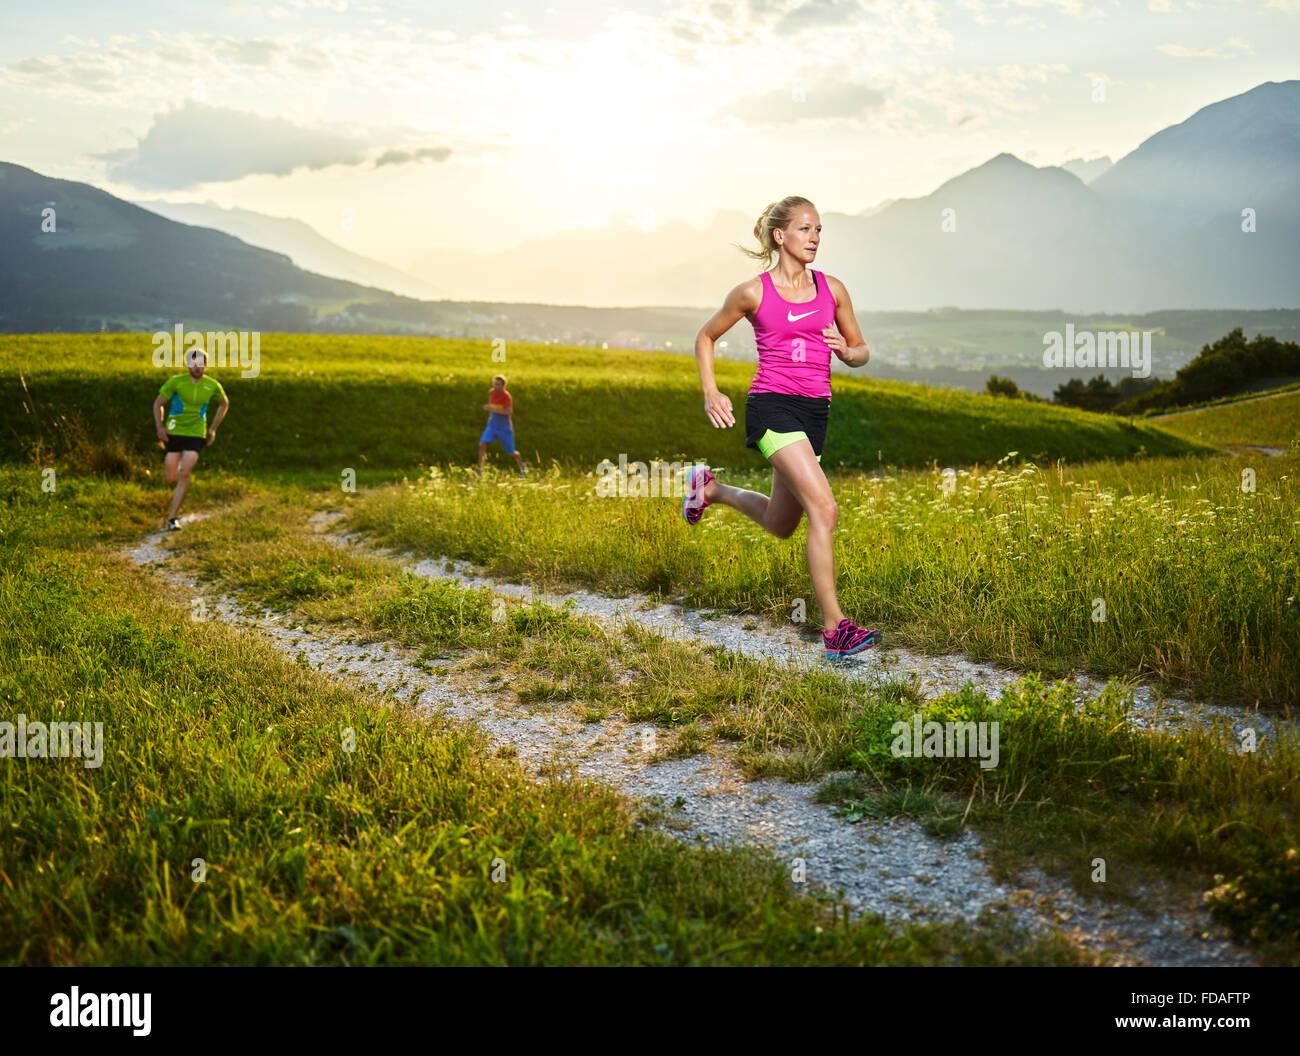 Young woman in her twenties running on path through fields, more runners behind, Rosengarten, Patsch, Tyrol, Austria - Stock Image